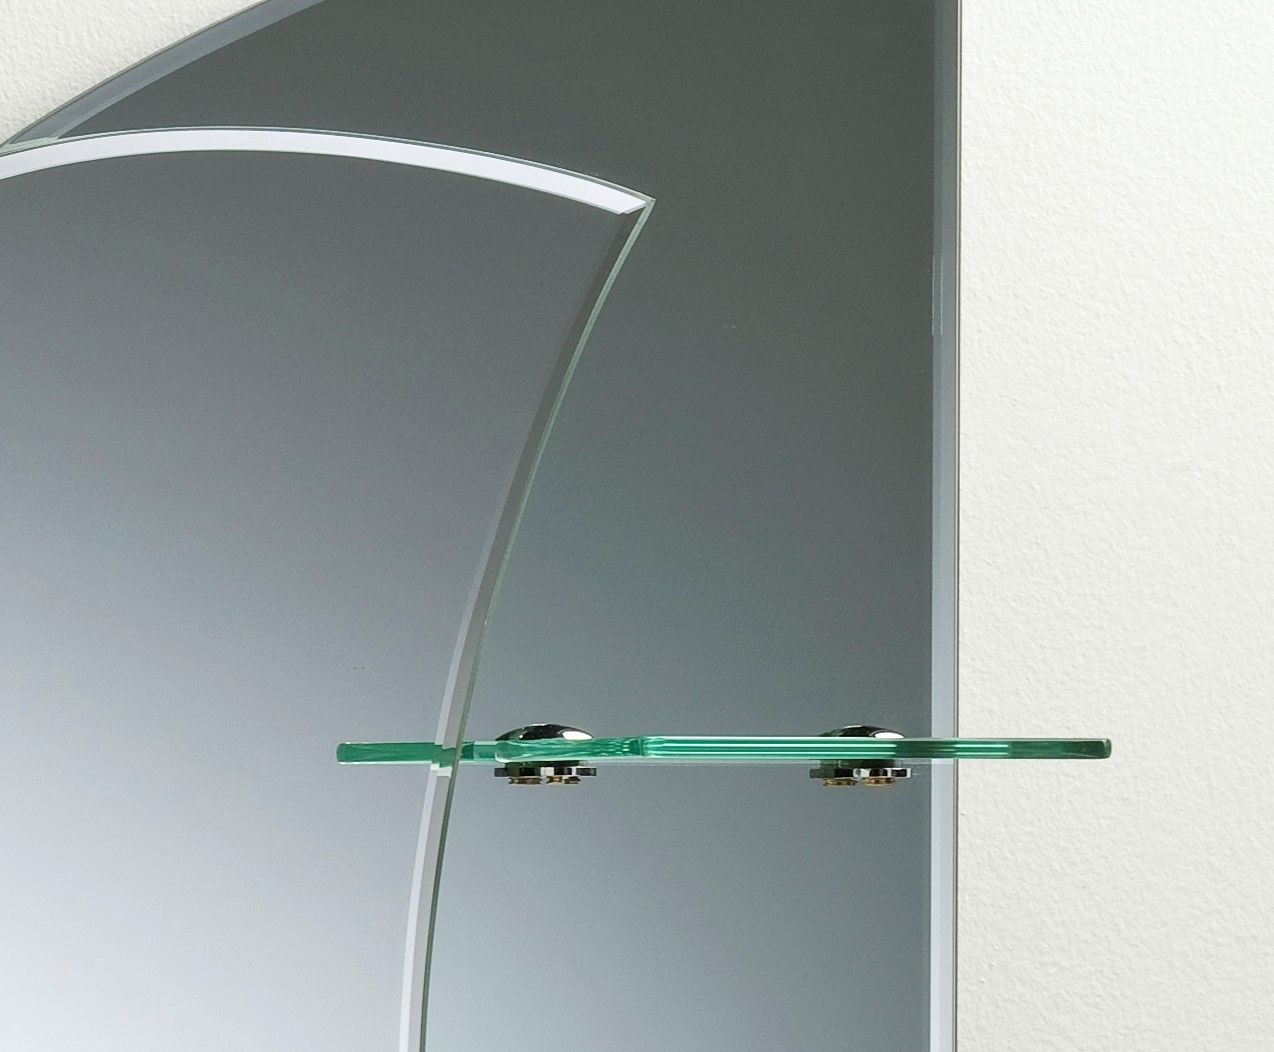 Nautical Bathroom Mirrors: BATHROOM MIRROR With Shelves Stunning NAUTICAL Design